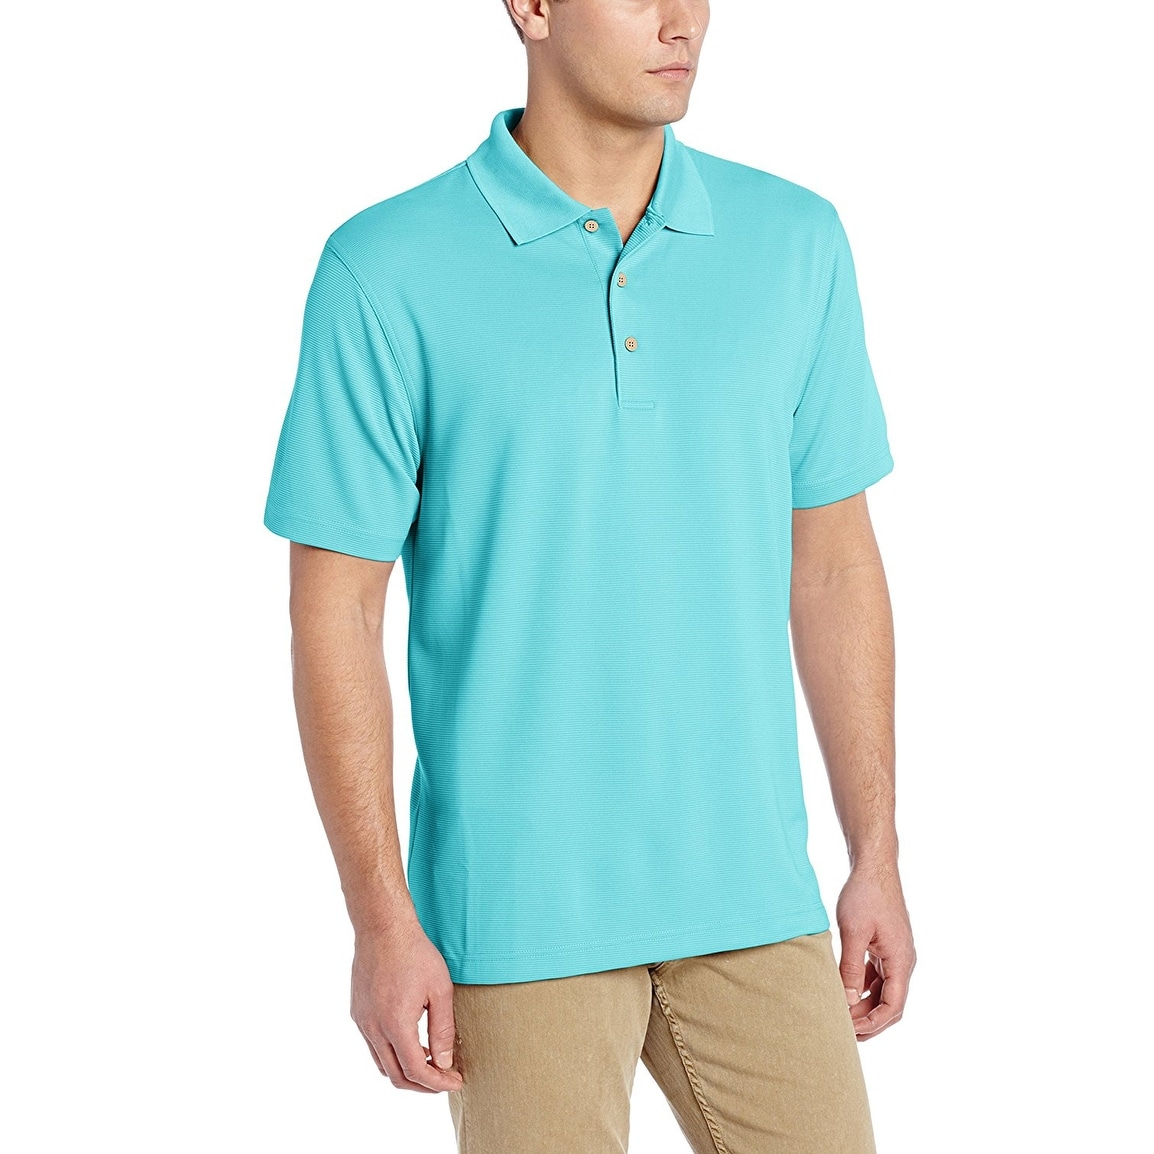 eaa644879 Shop Cubavera Men's Essential Textured Performance Polo Shirt - Free ...